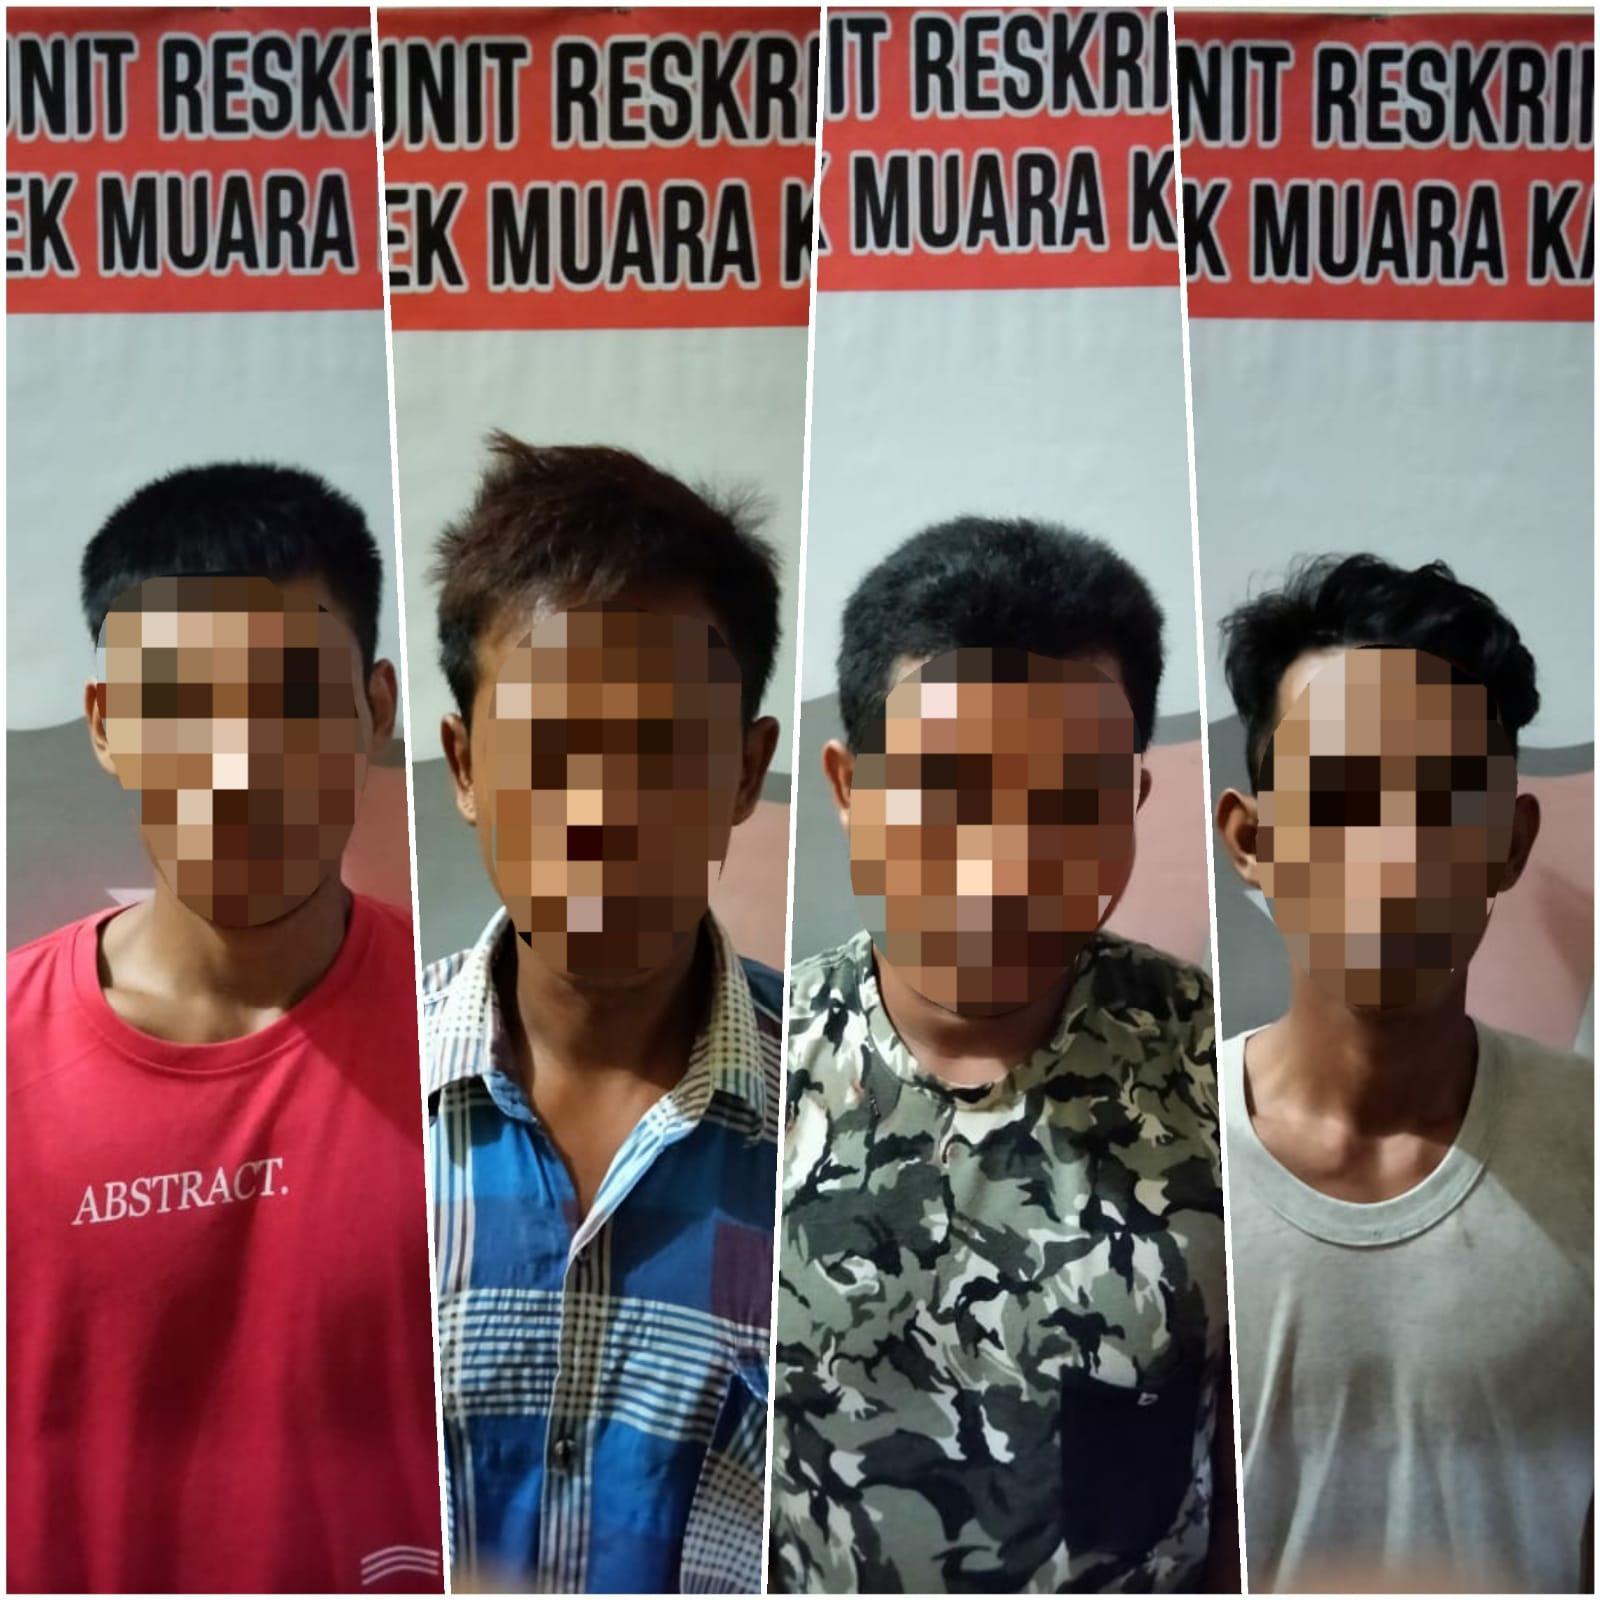 Gerak Cepat, Polsek Muara Kaman Berhasil Amankan 4 Orang Pelaku Penyalahgunaan Narkotika